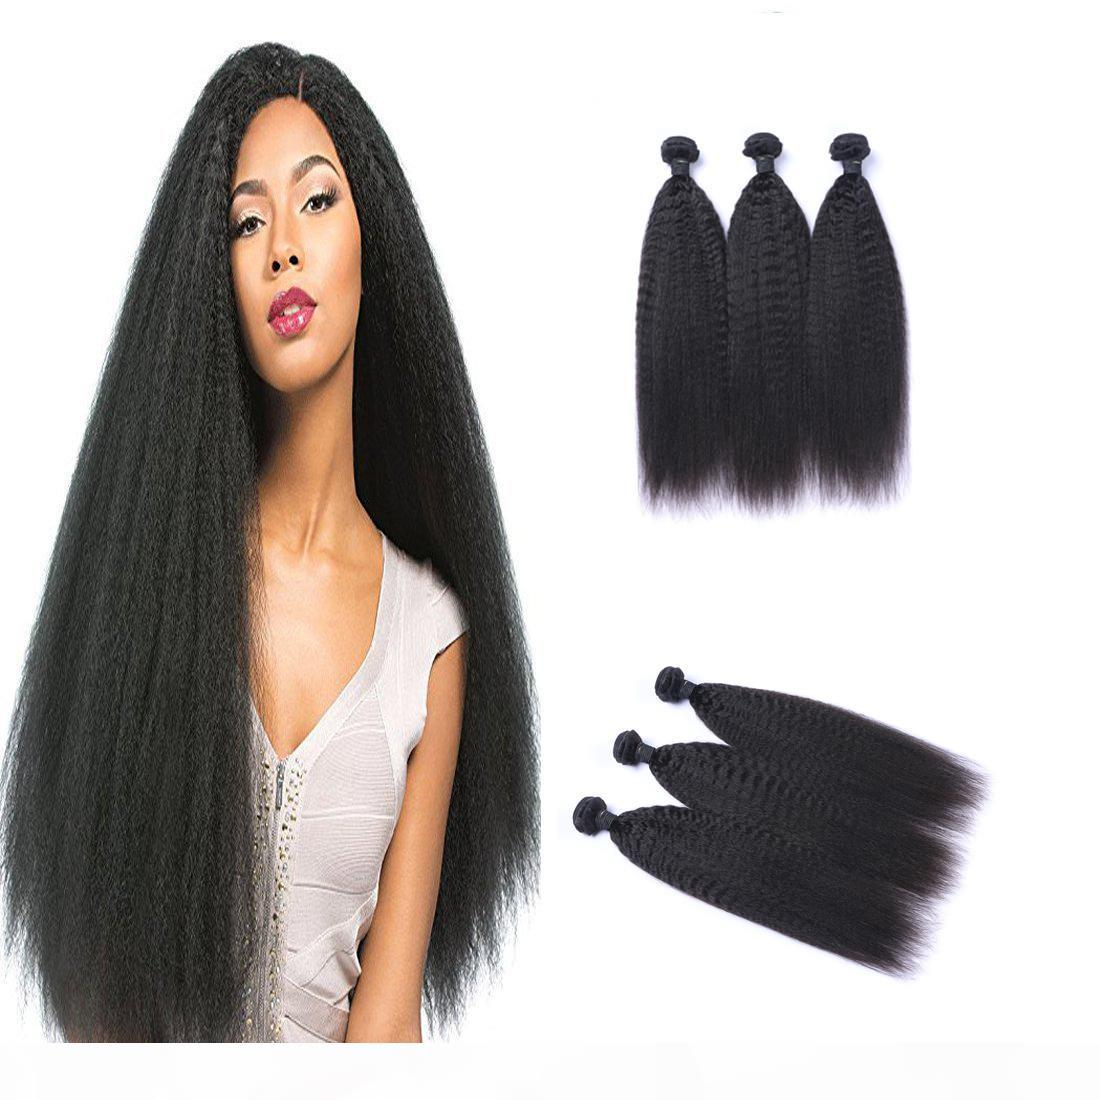 Malasia Kinky recta 100% sin procesar el cabello virgen humano tejido Remy Human Hair Extensions Human Hair Weages Dyable 3 Bundles